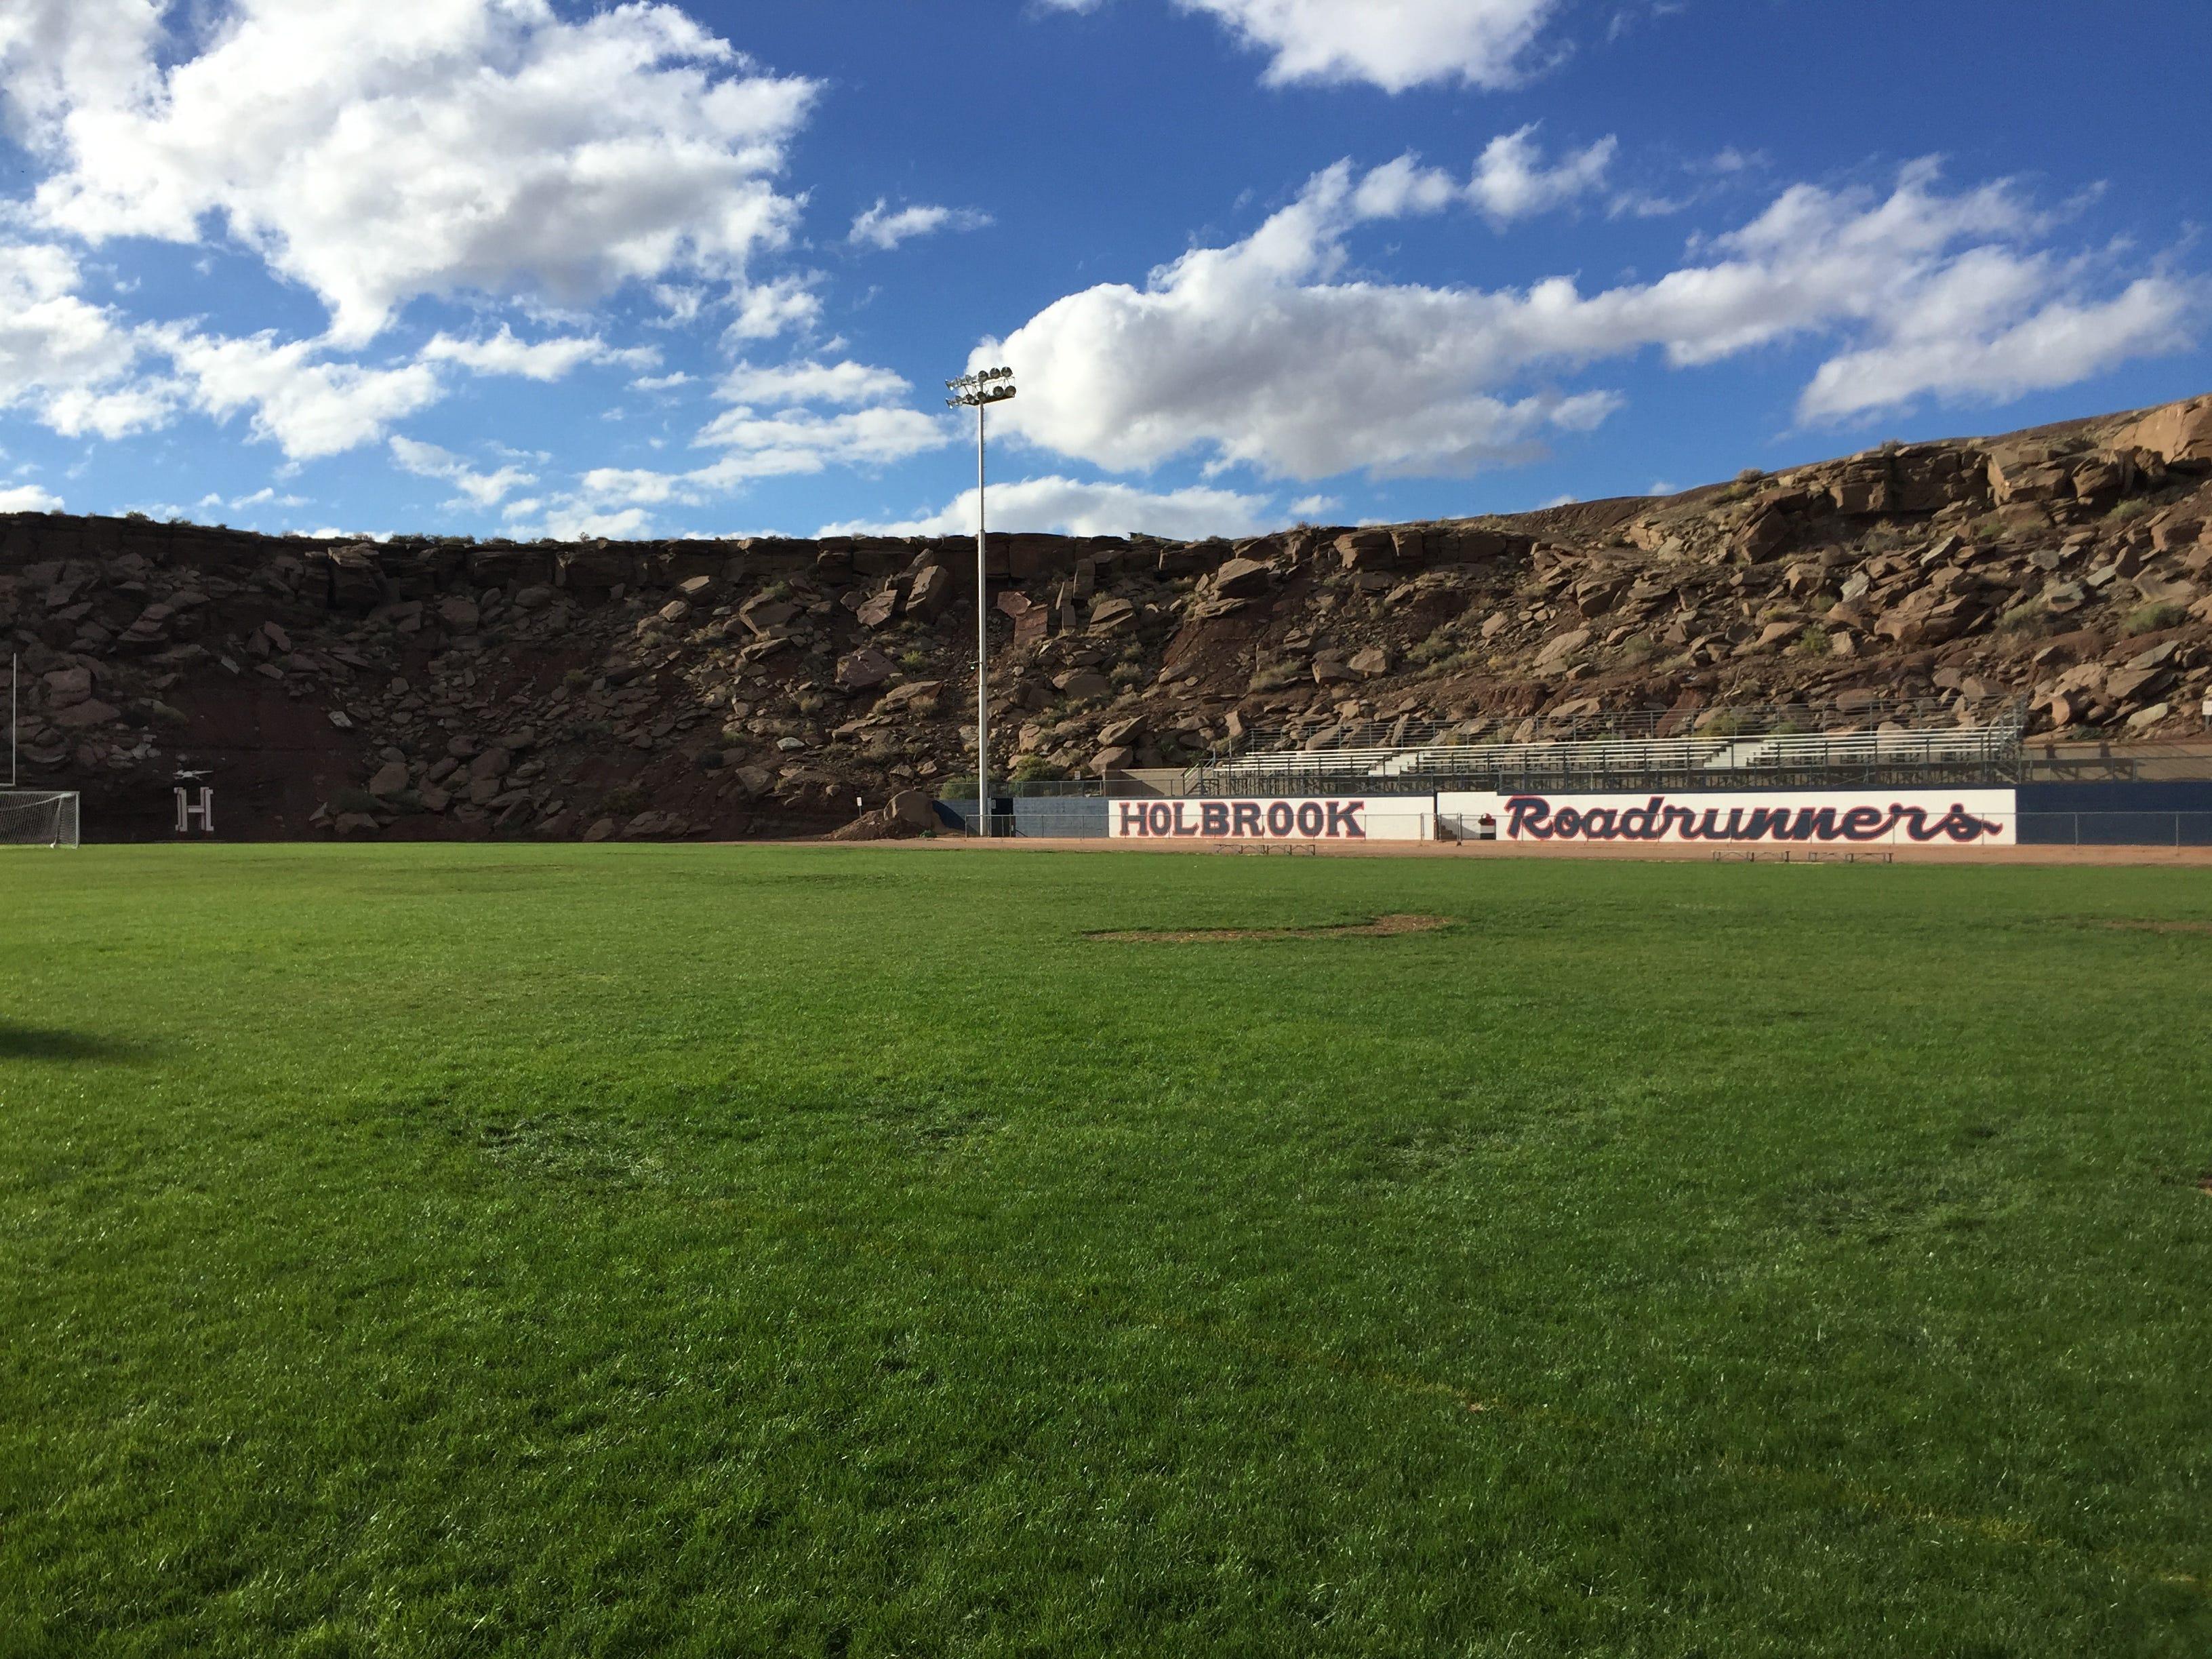 Holbrook High School's football stadium